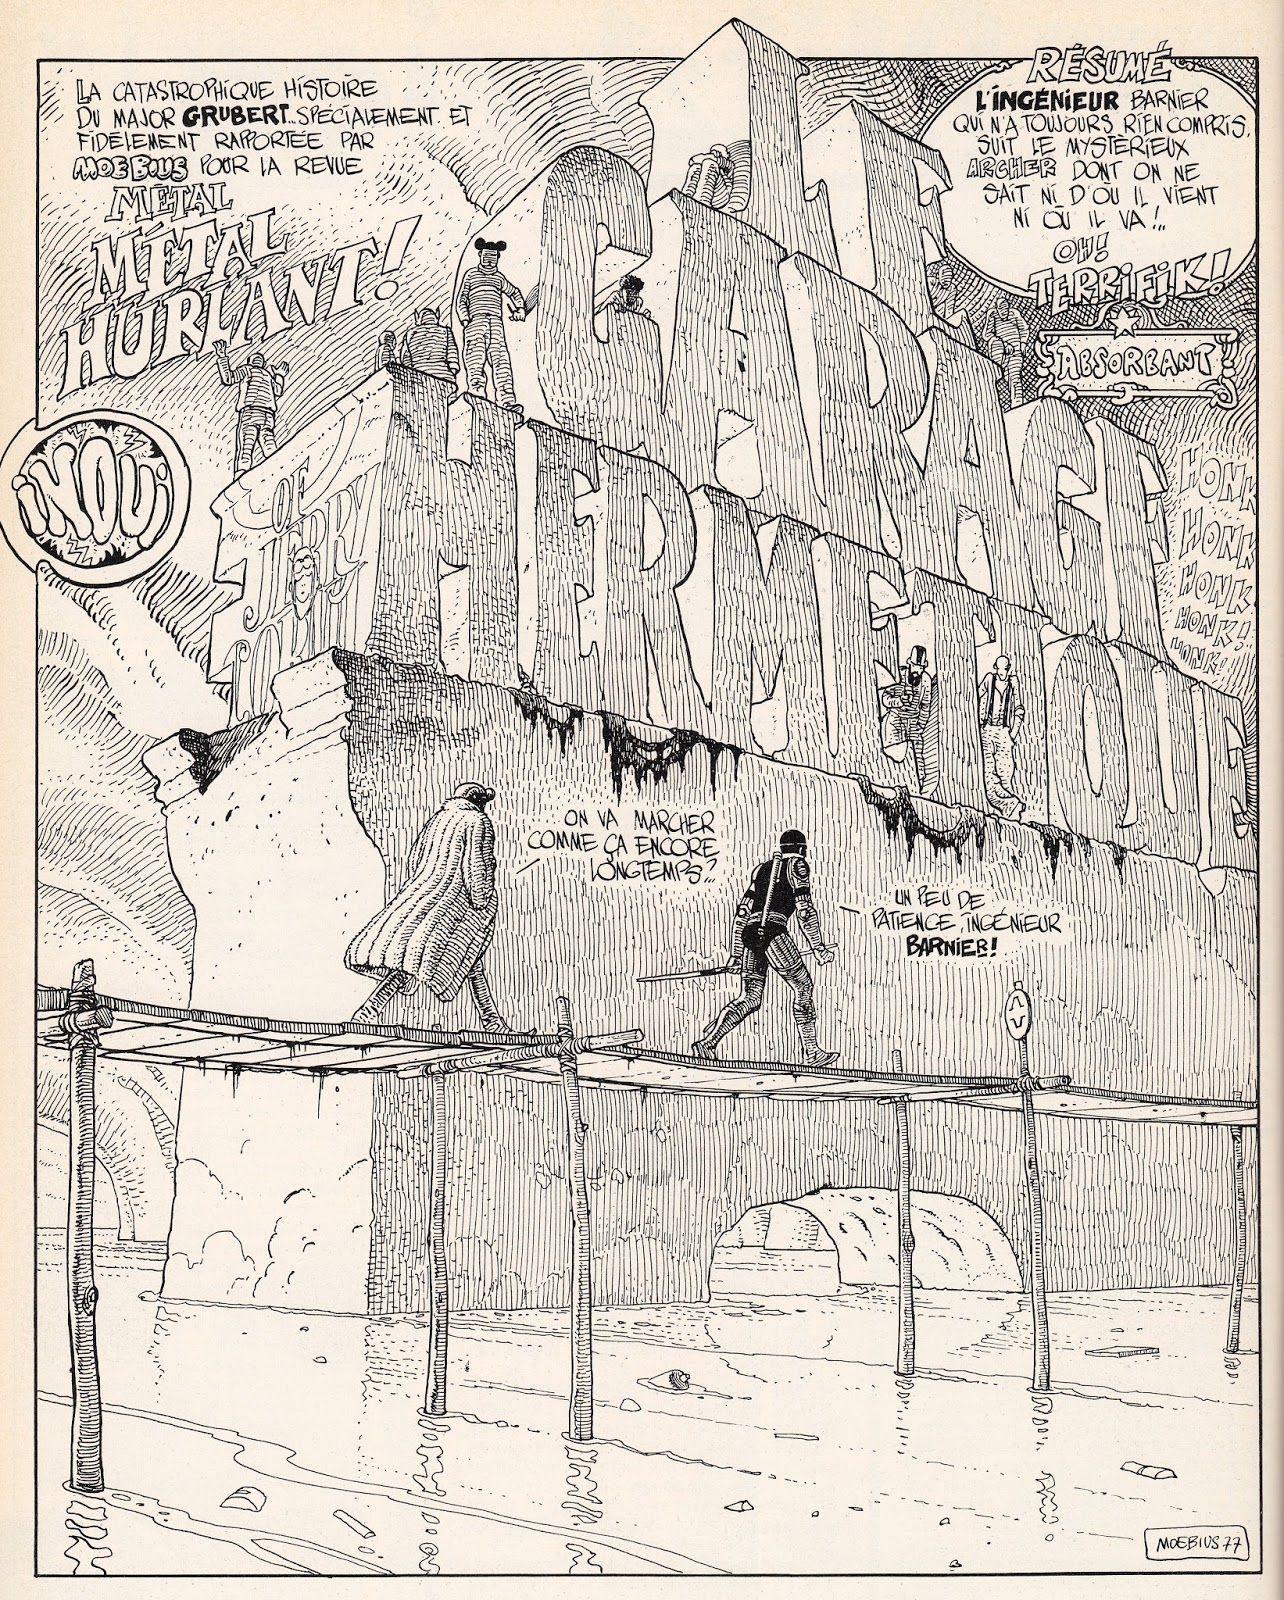 Alan ford gruppo t n t ubc enciclopedia online del fumetto - Le Garage Hermetique Moebius